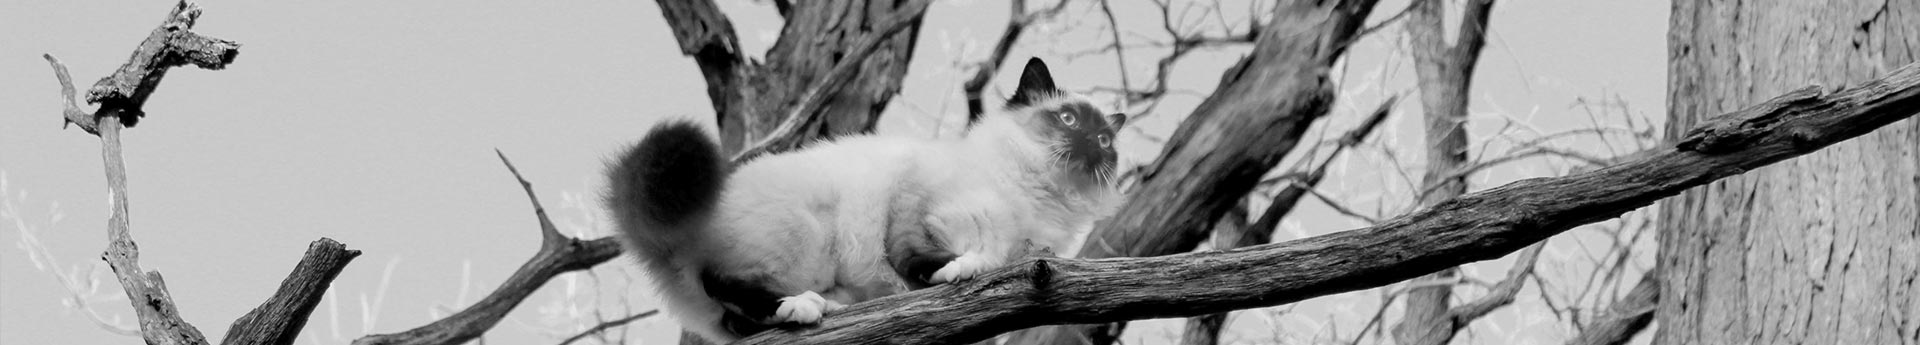 Siamese cat in a tree - Adventurous Finch from Grayslake, Illinois